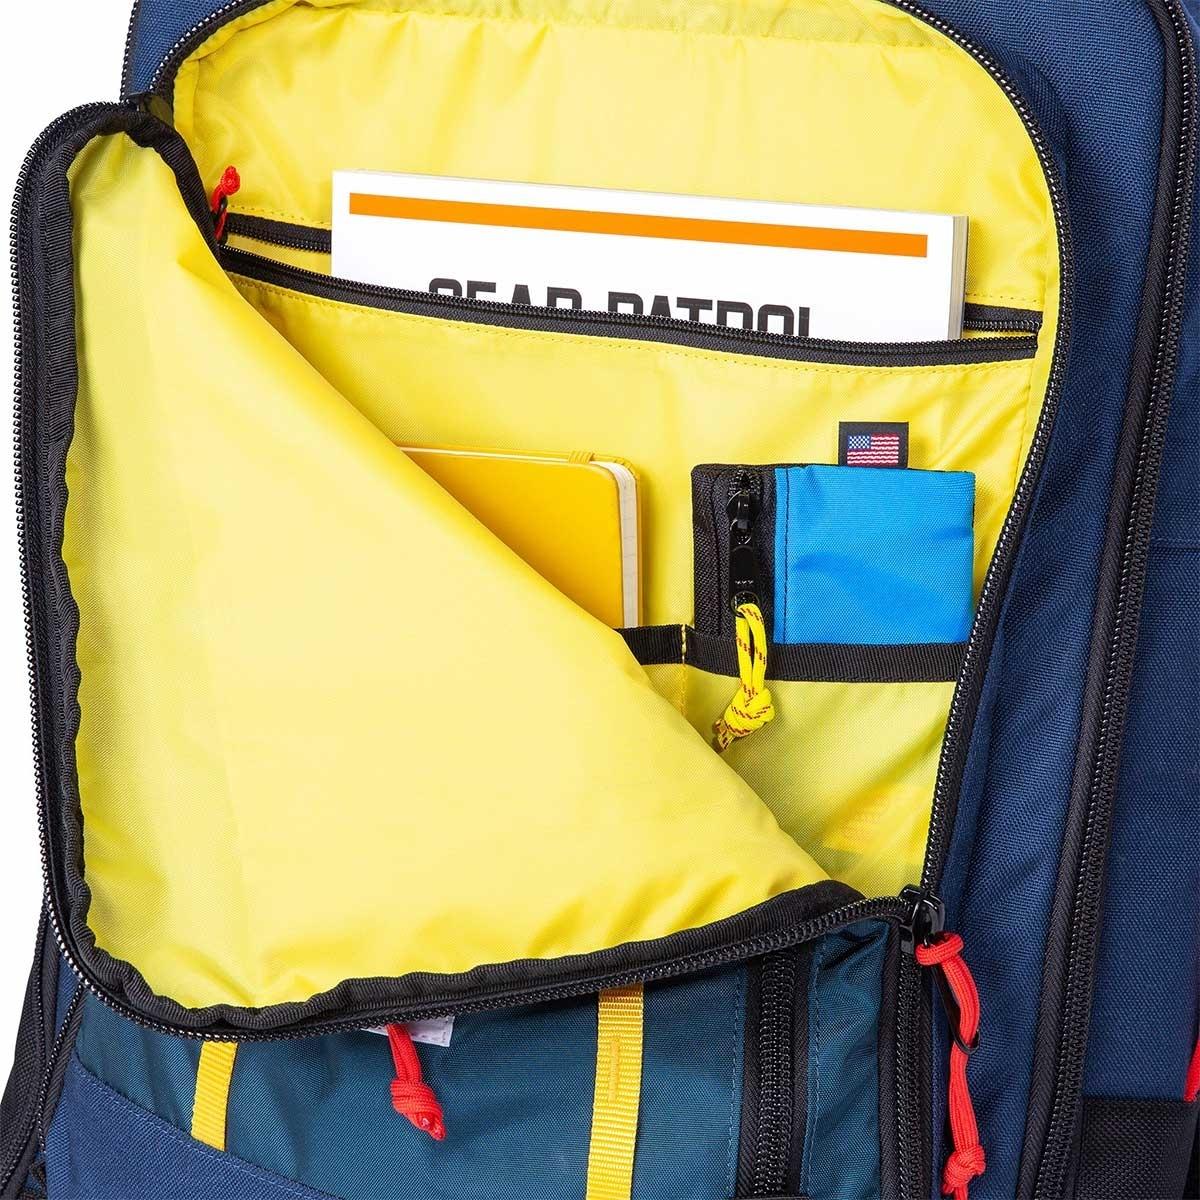 Topo Designs Travel Bag 40L Navy, the most versatile travel bag, guaranteed